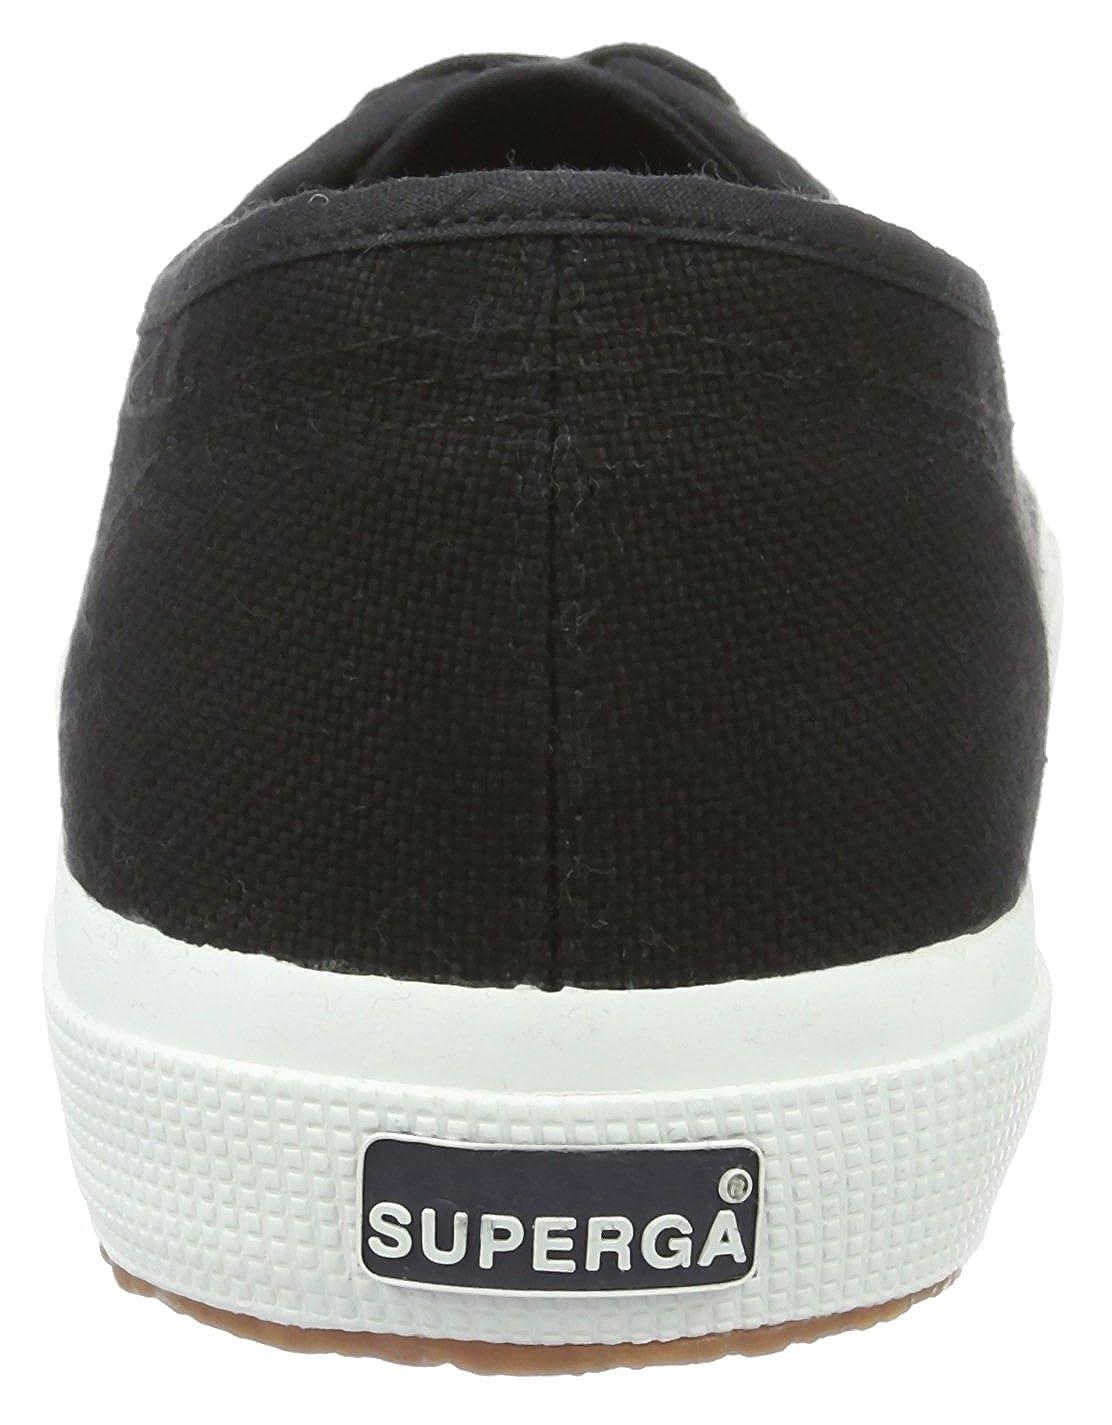 Superga Superga Superga Unisex-Erwachsene 2750 Cotu Classic Low-Top rot 38 EU  e33e84